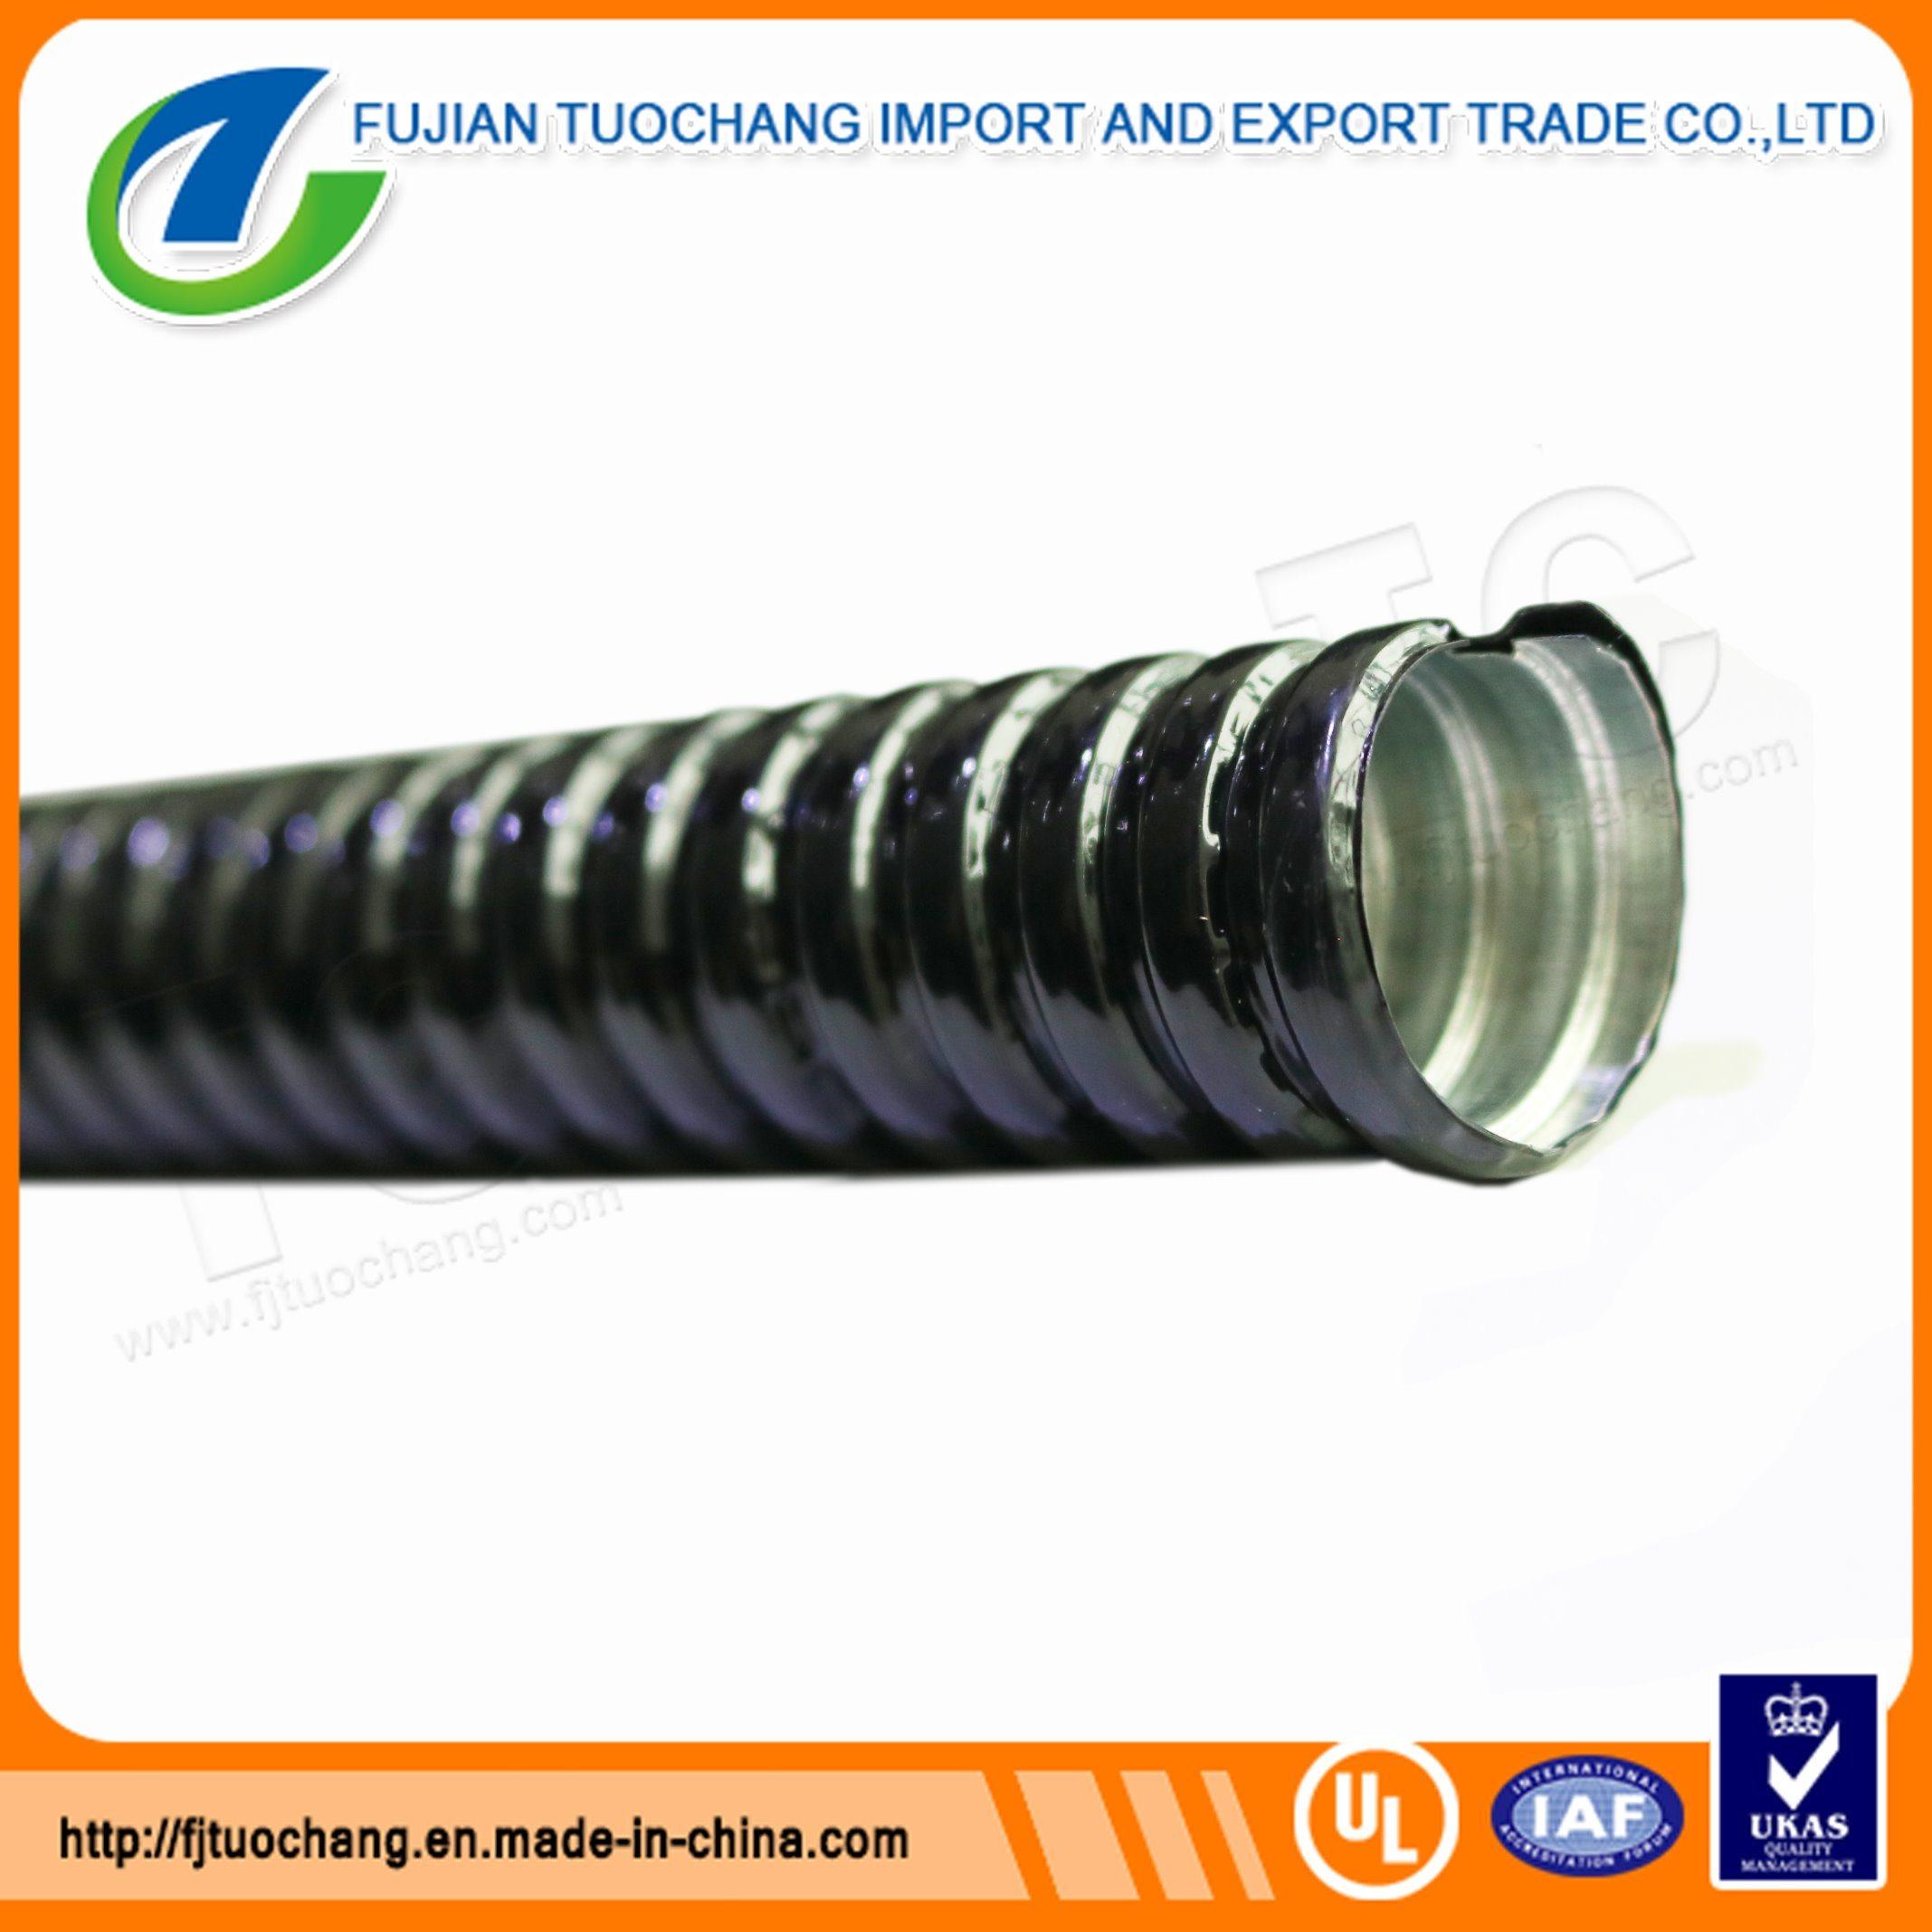 Gi PVC Coated Flexible Pipe Electrical Metal Conduit